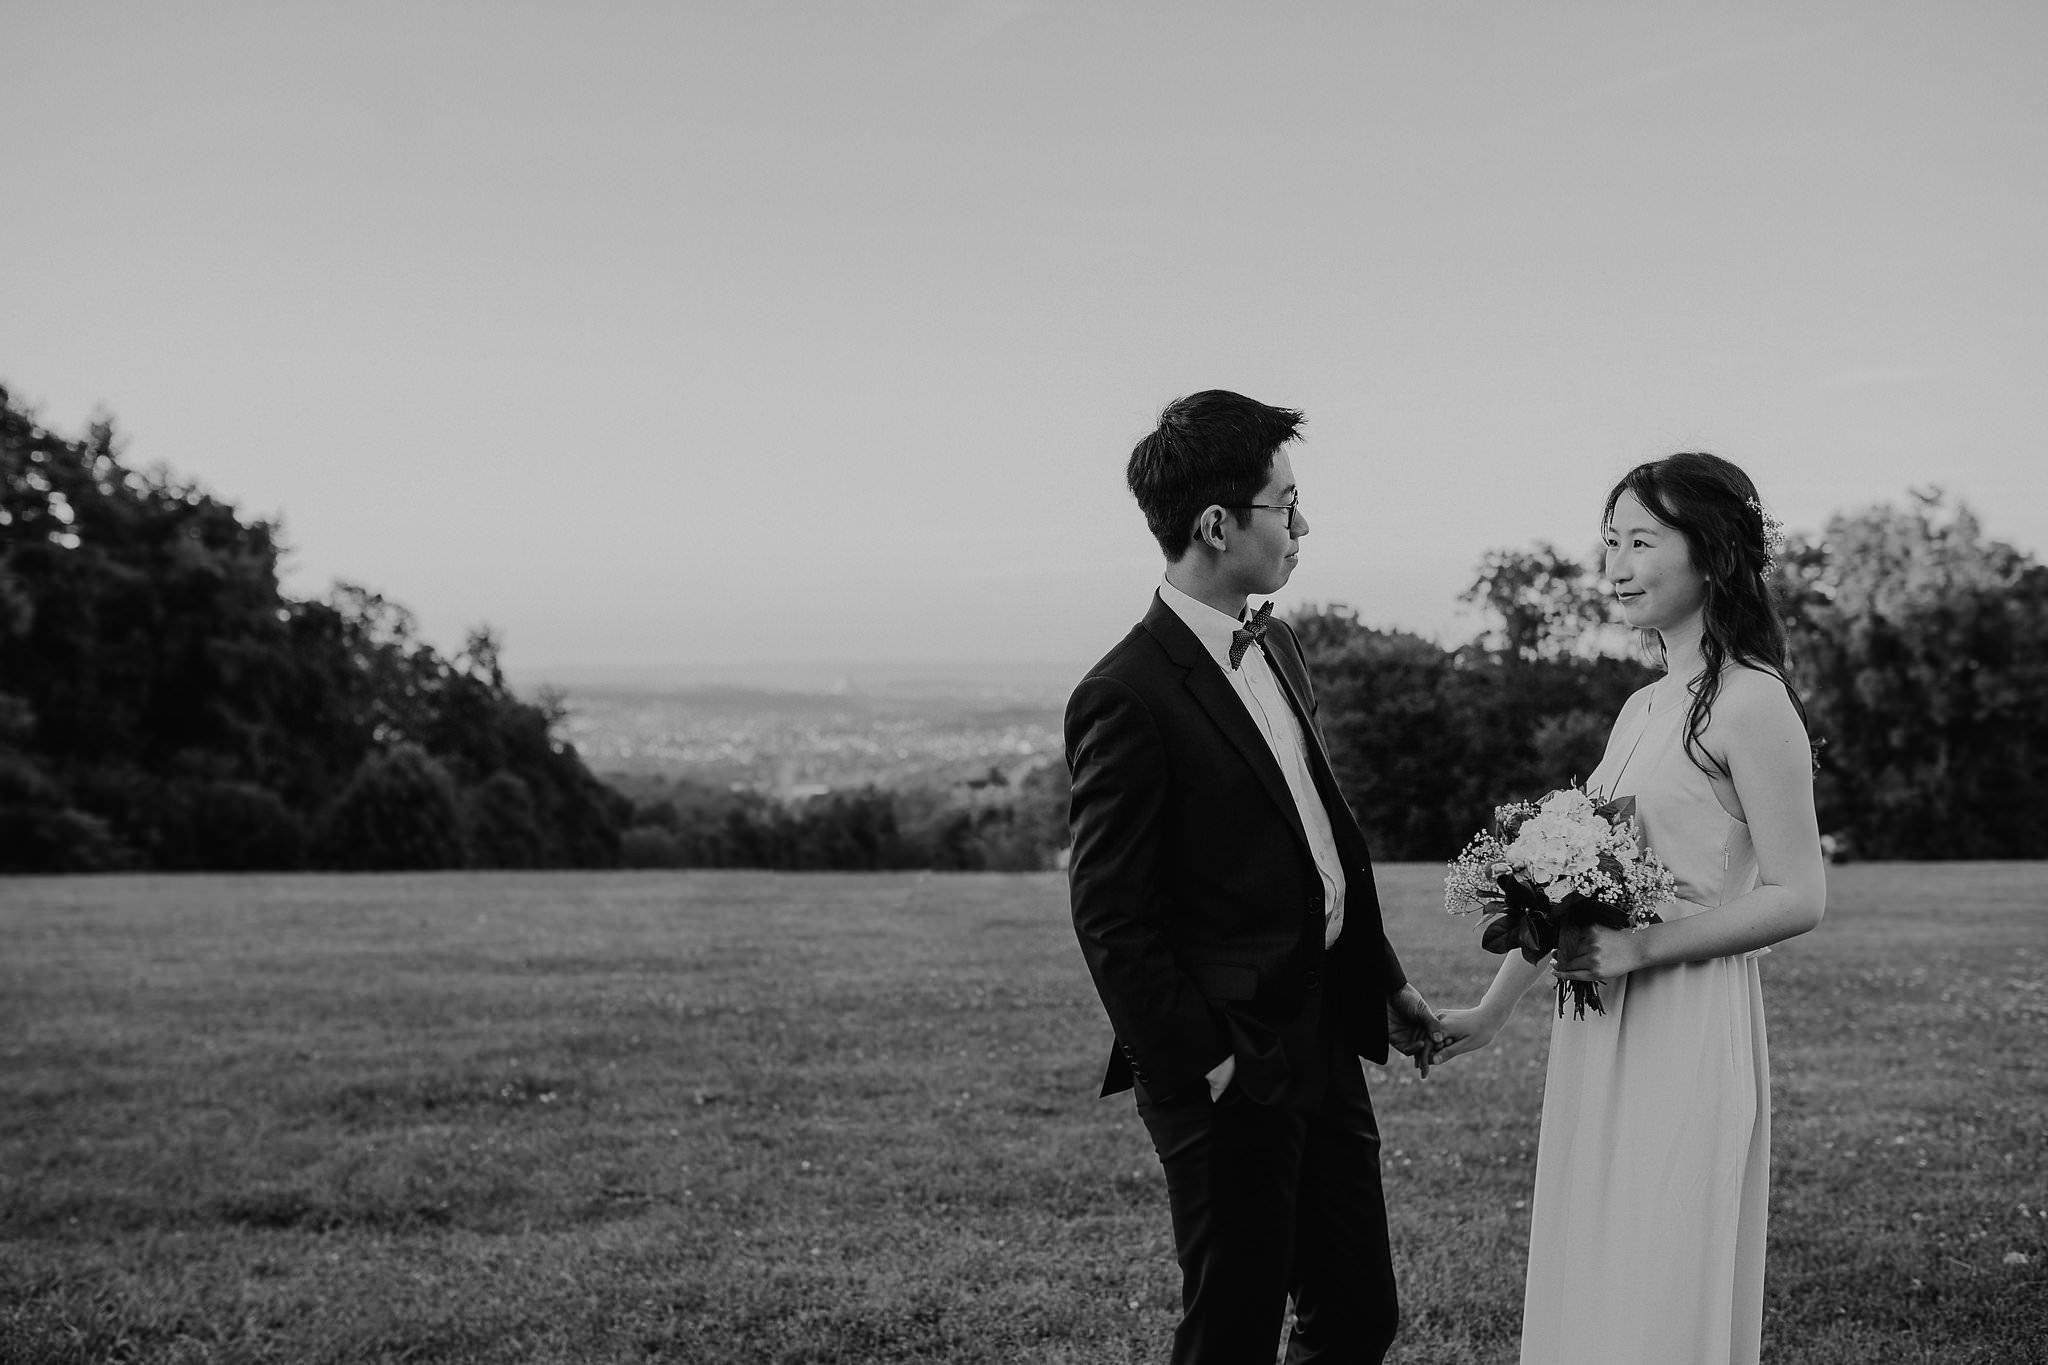 wedding photographer hamilton new zealand 1021 5